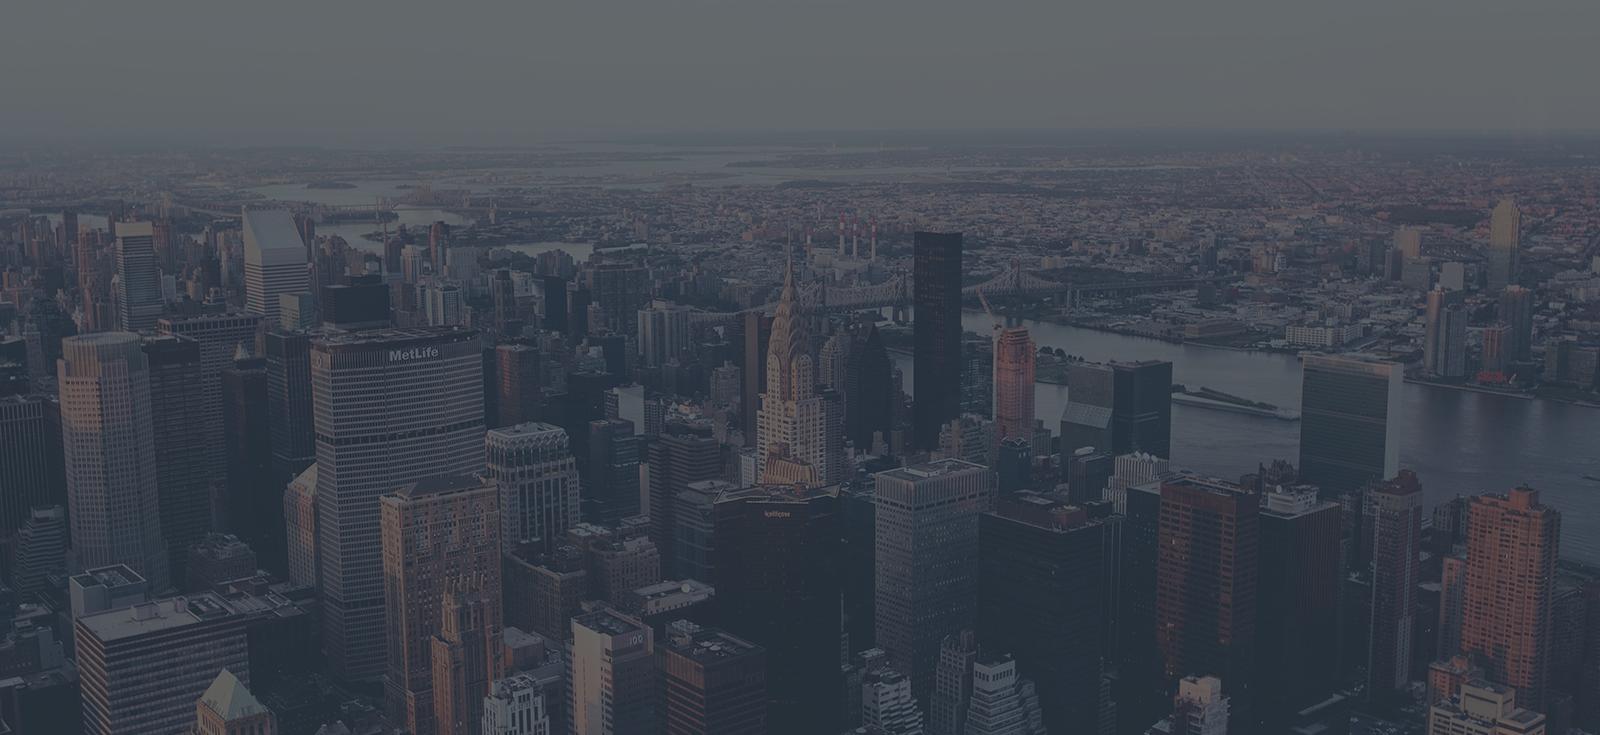 New York seznamka poradenství